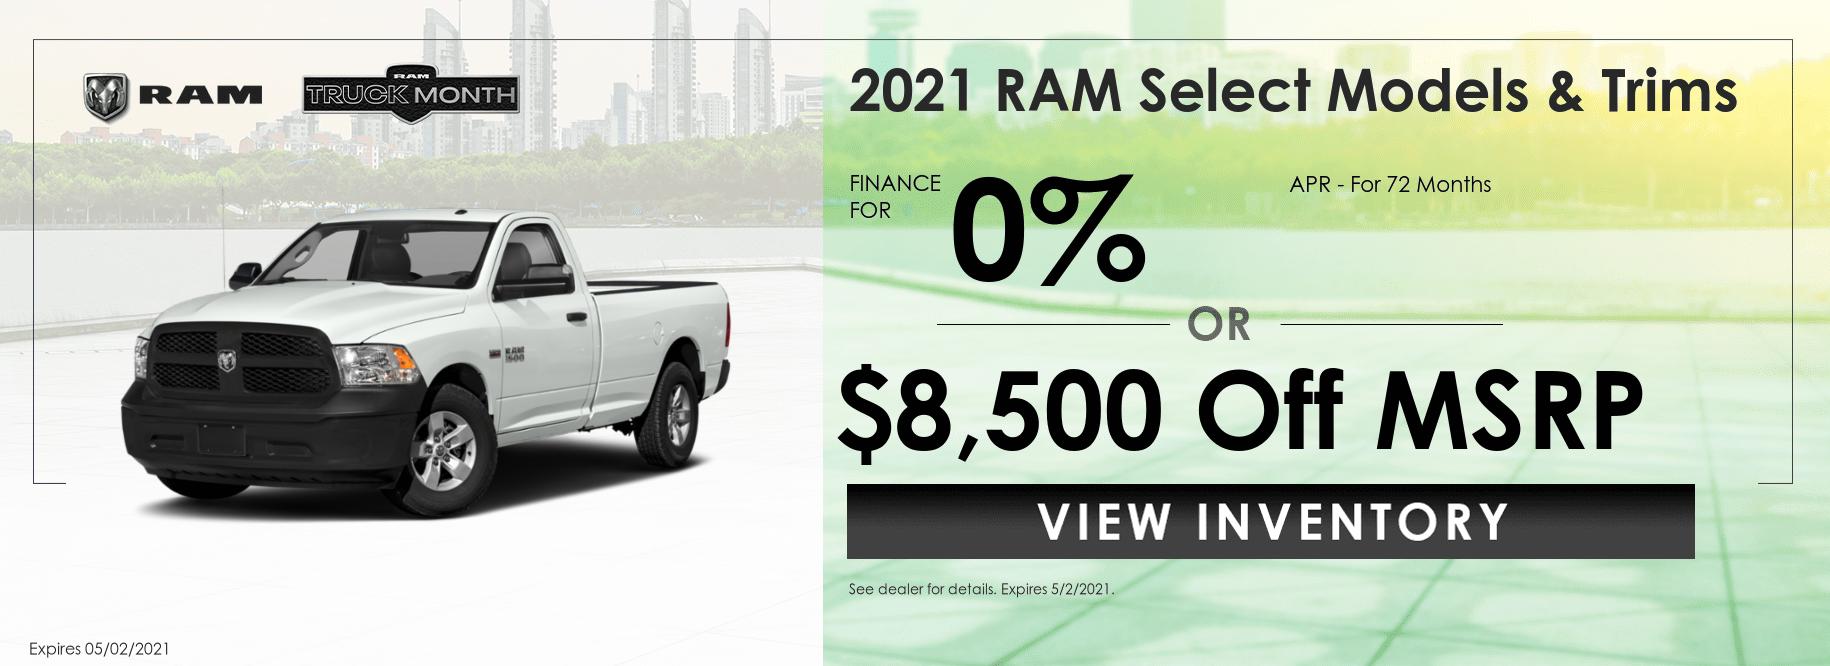 2021-RAM-Select-Models-&-Trims–63